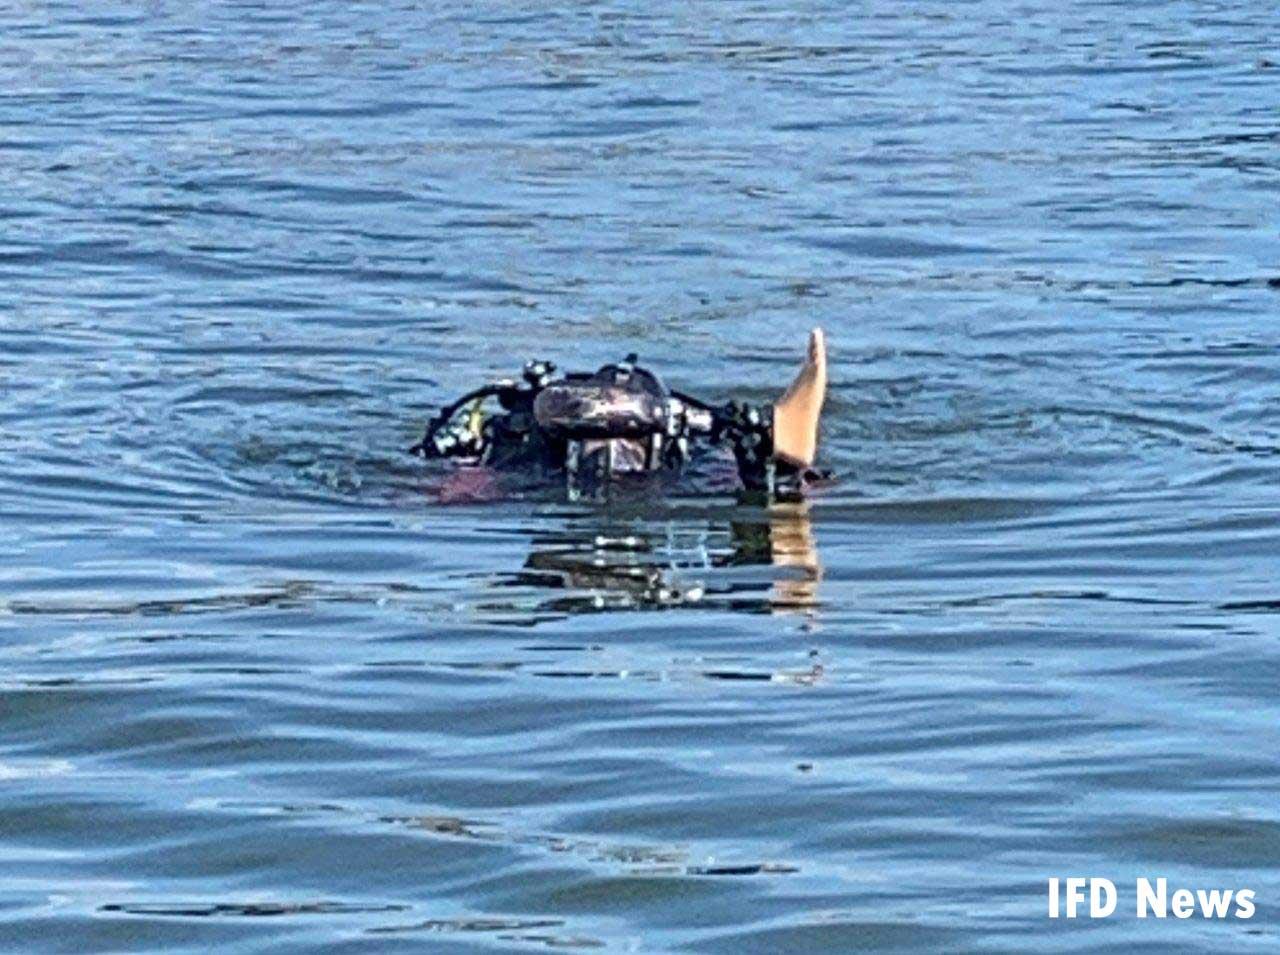 Prosthetic leg floating in water